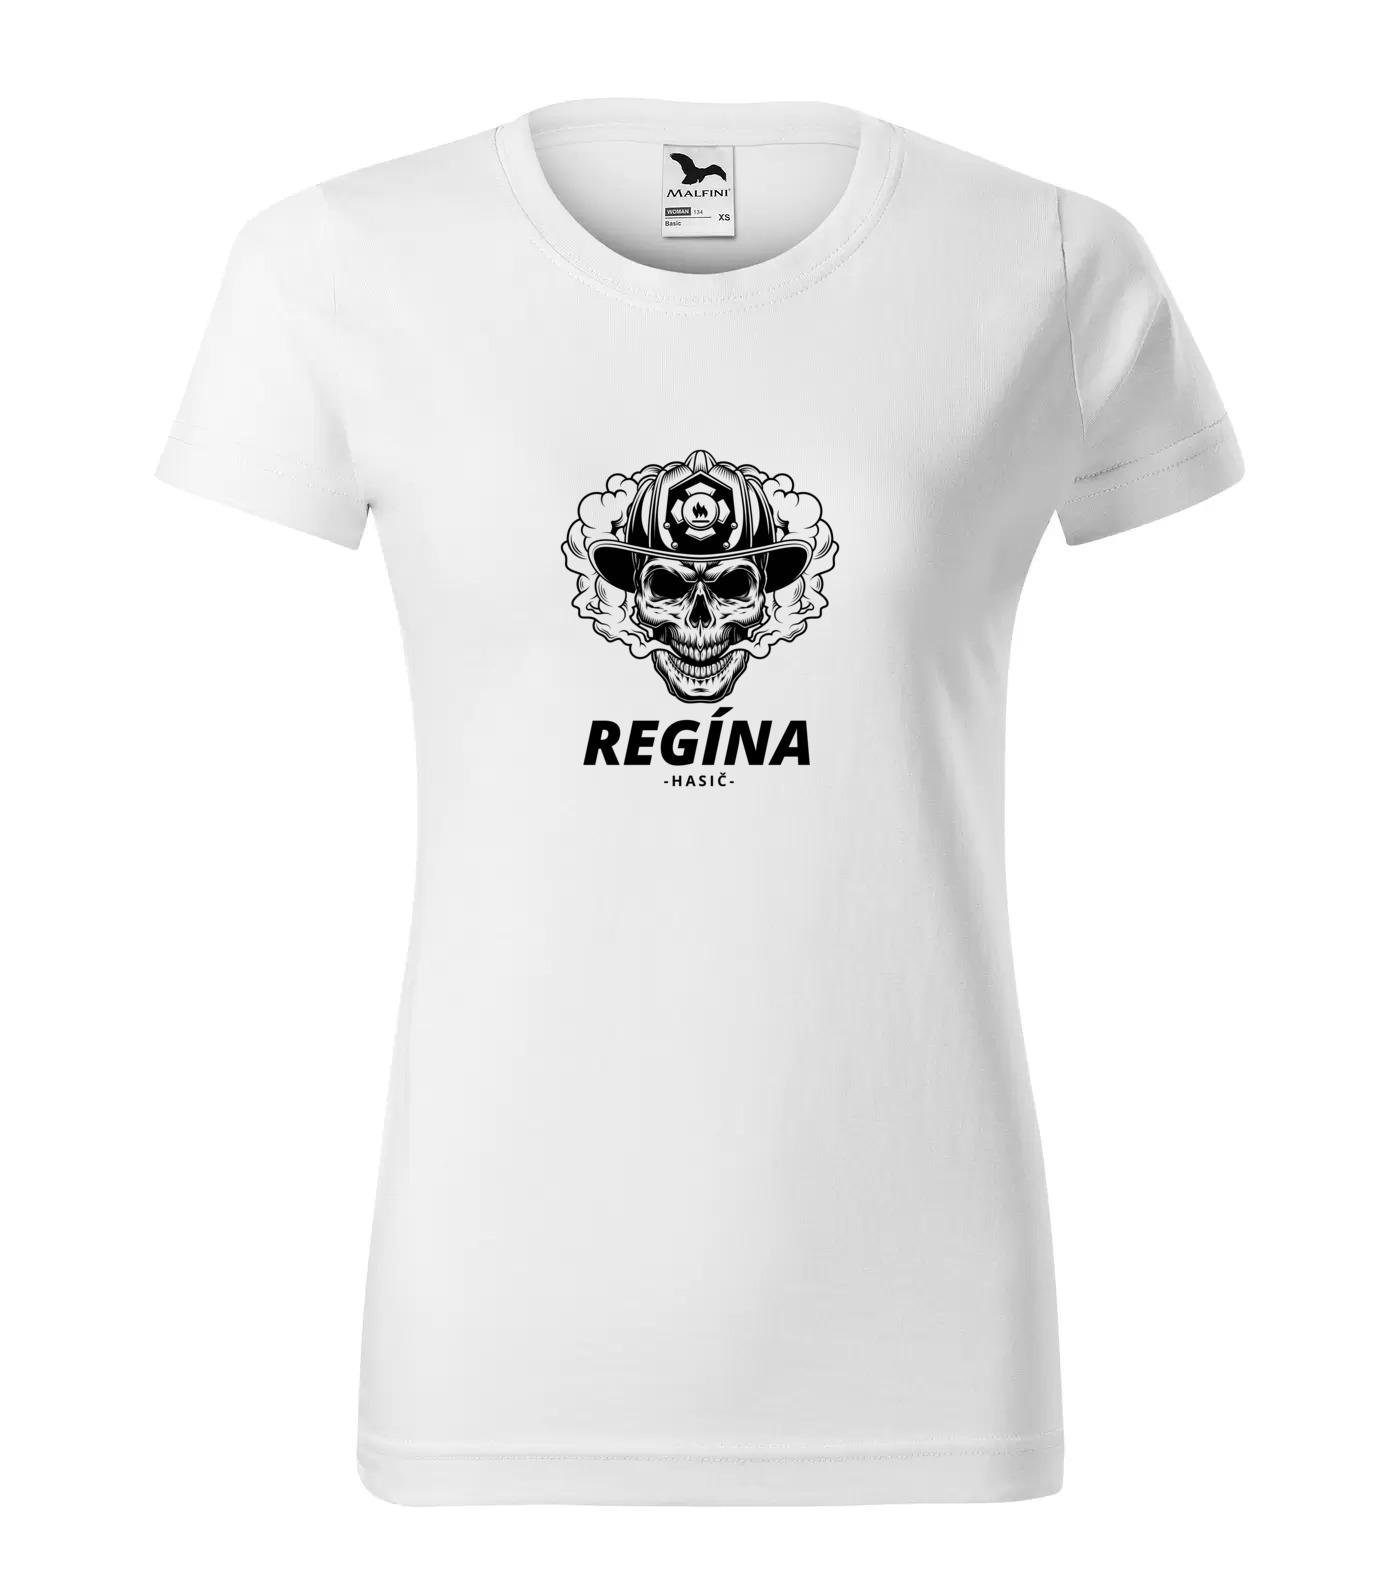 Tričko Hasič Regína